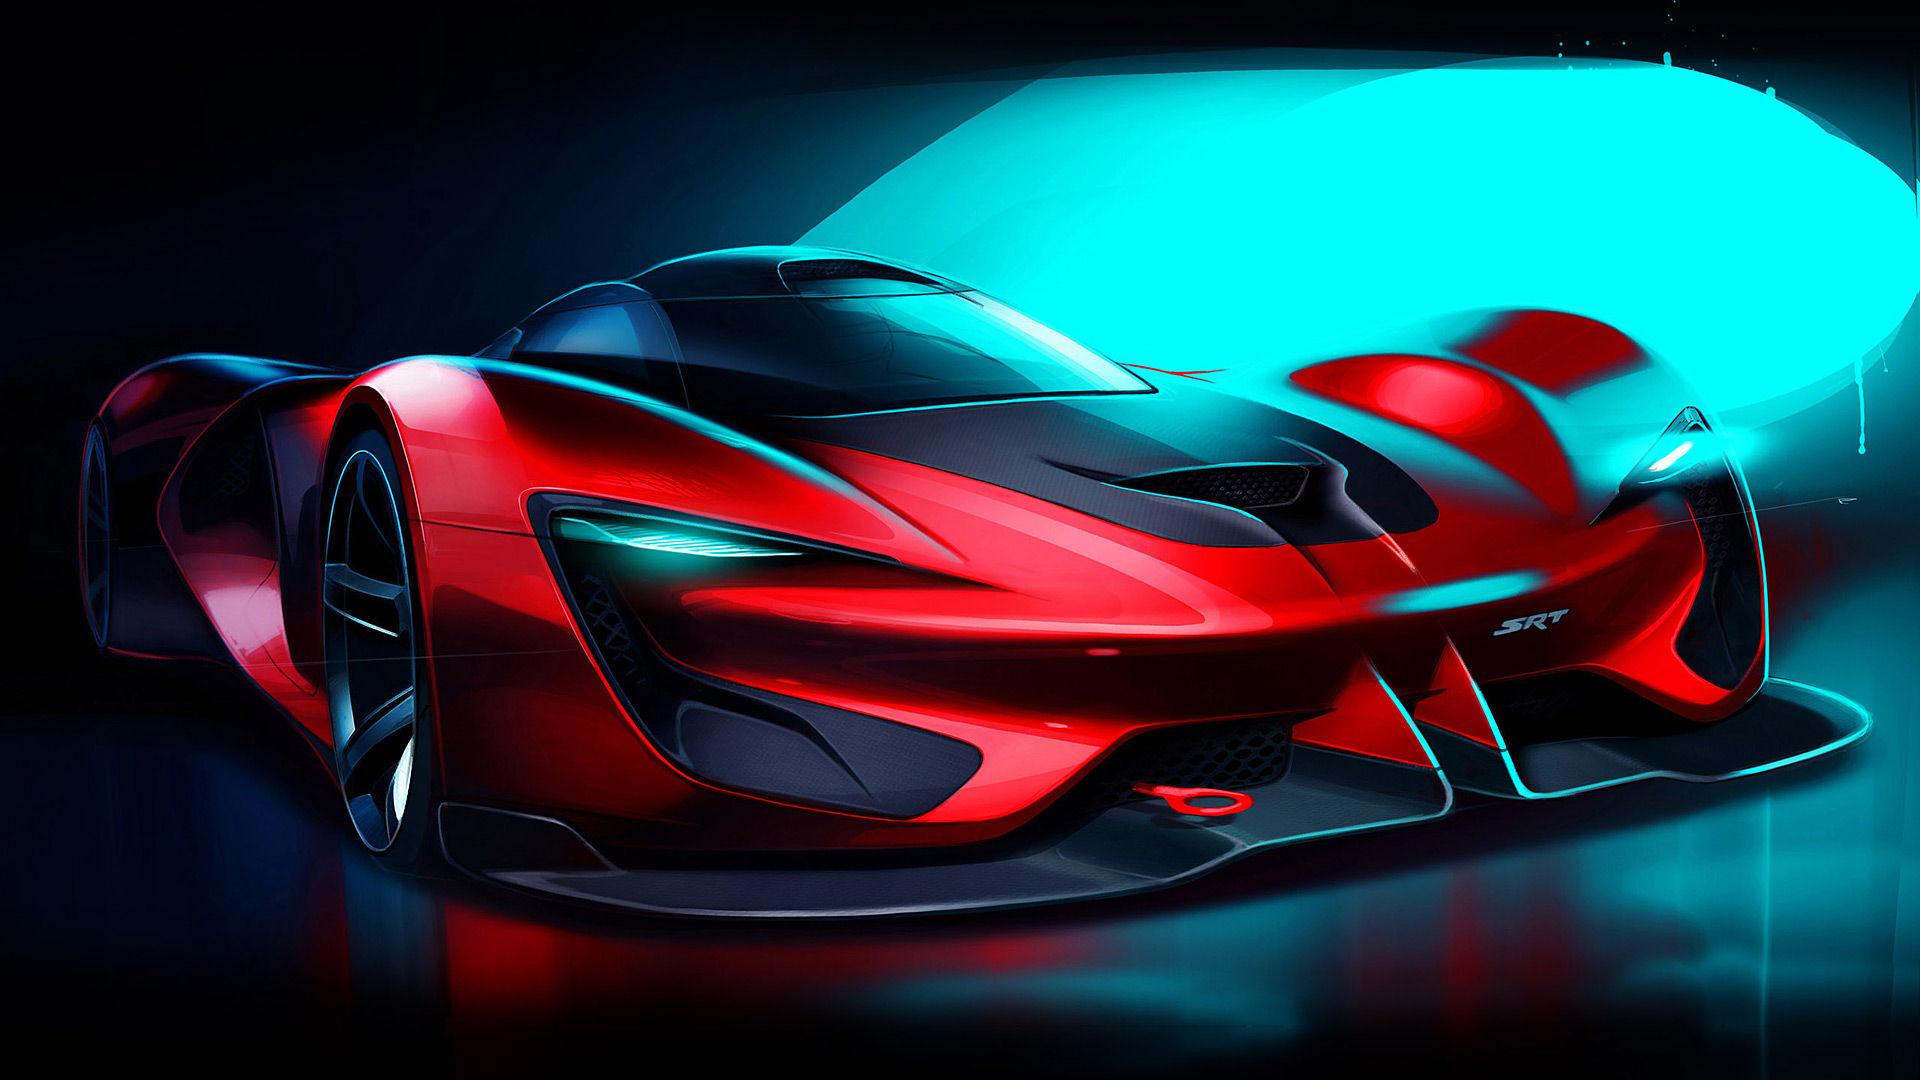 2015 Dodge SRT Tomahawk Vision Gran Turismo